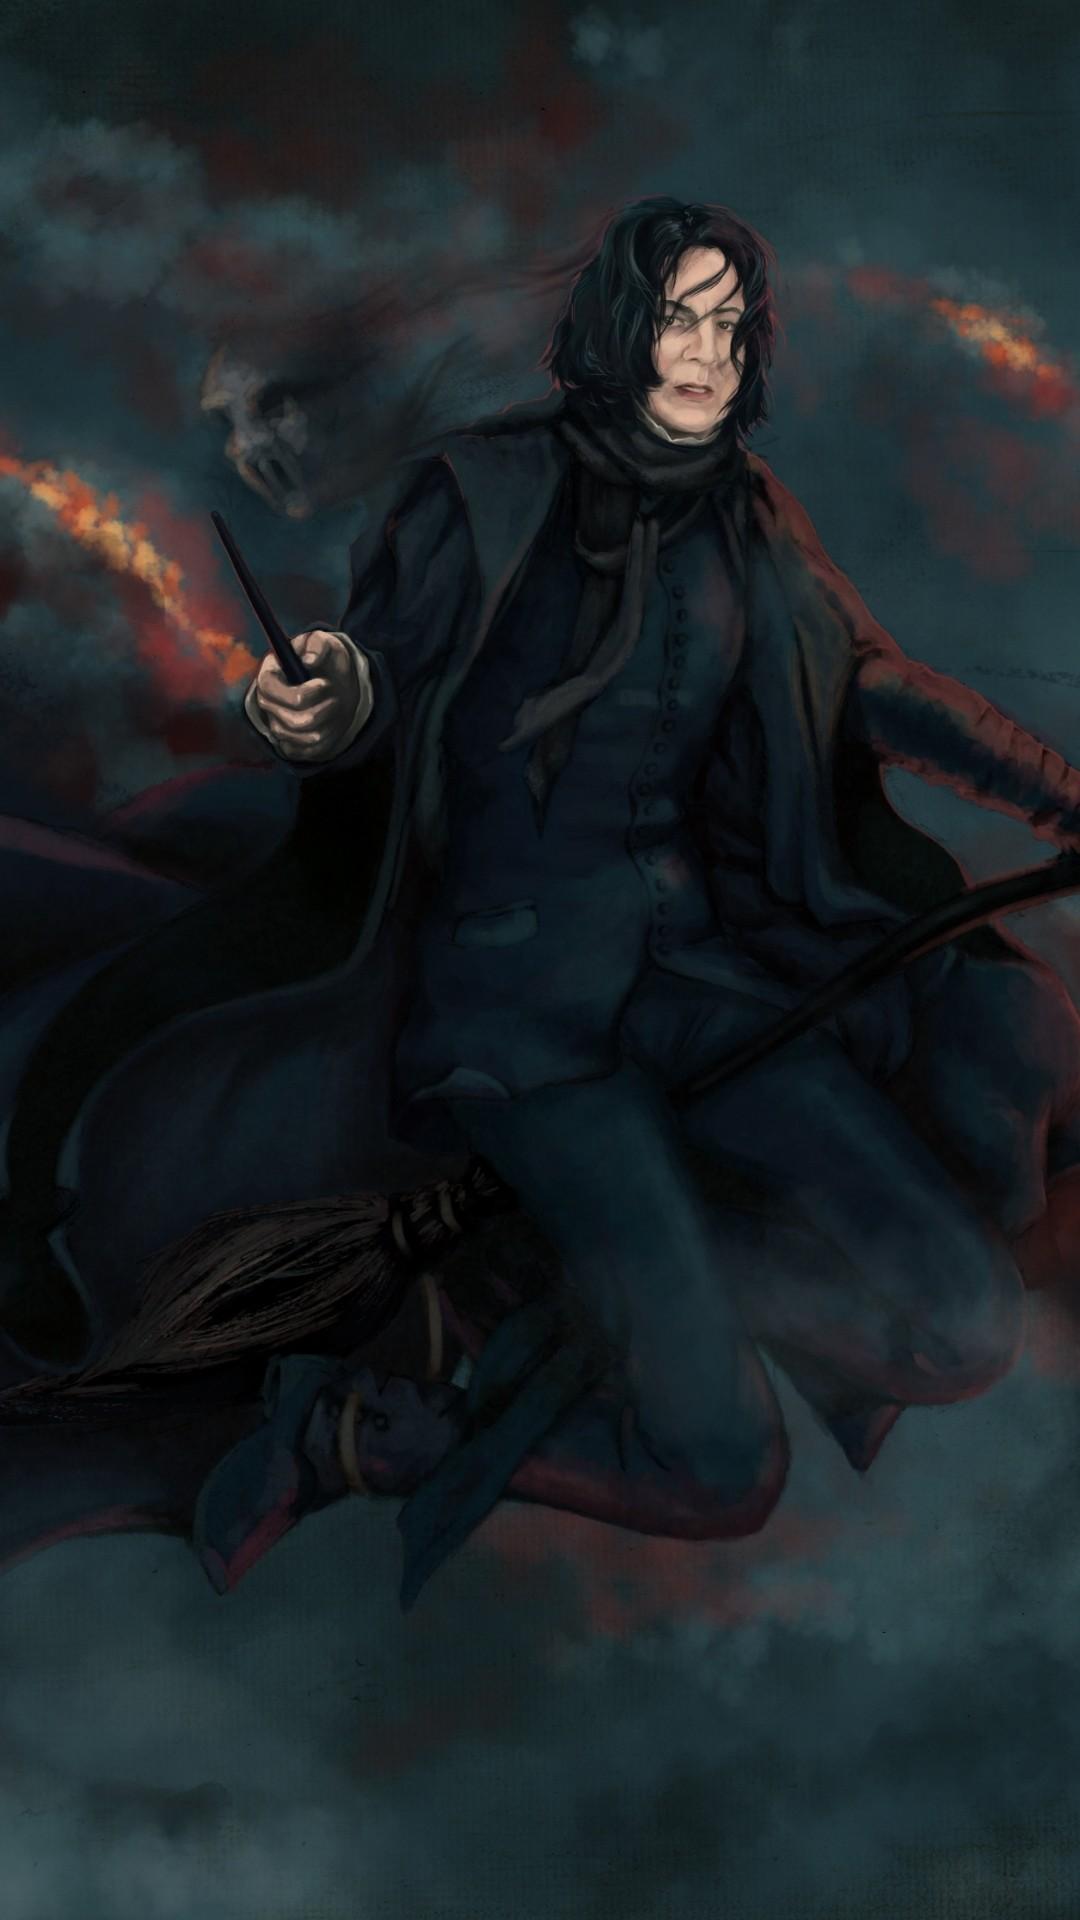 Download Wallpaper Harry Potter Expecto Patronum - 168560  Photograph_547122.jpg